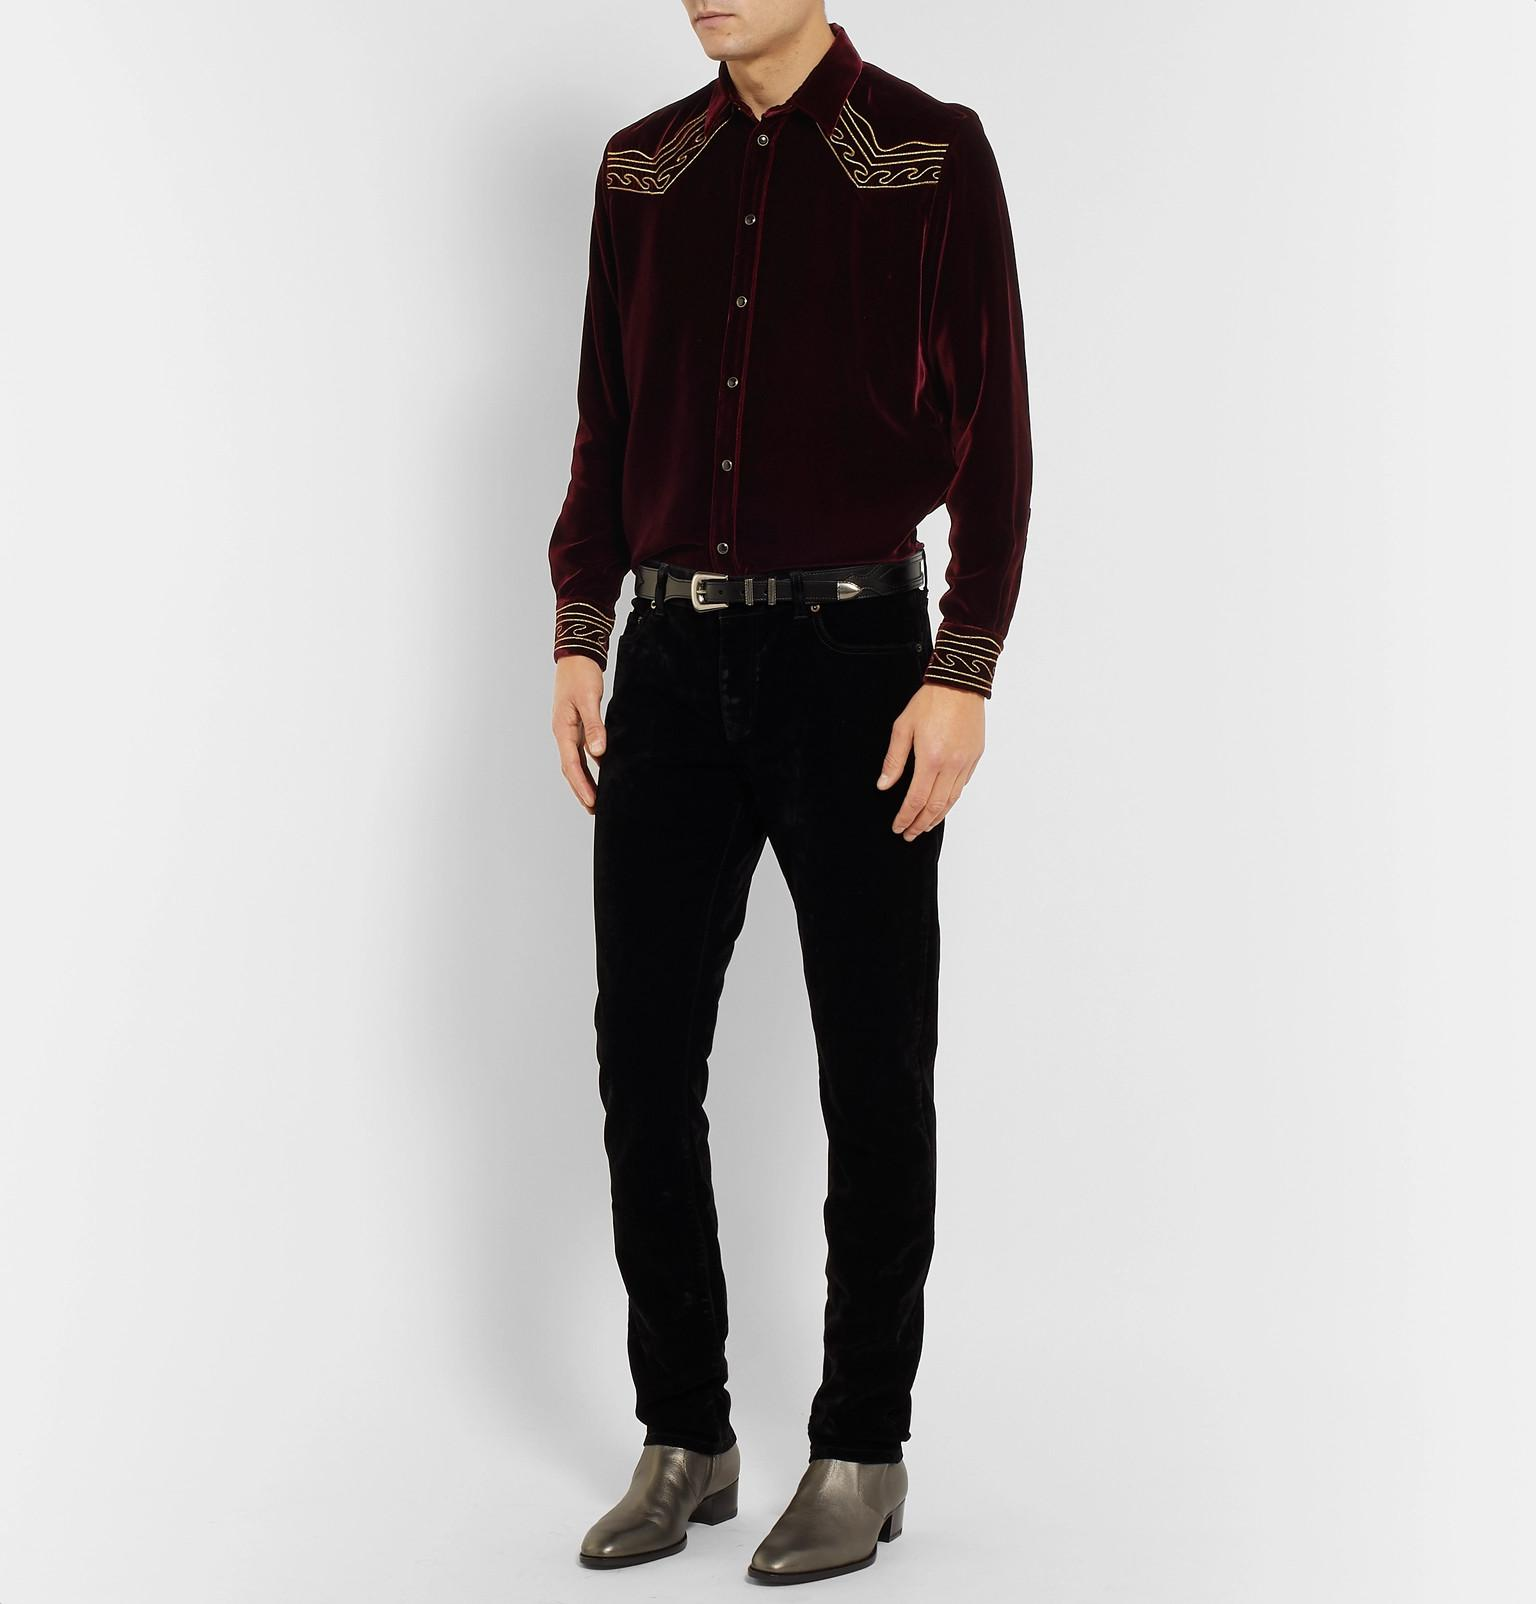 Saint Laurent Slim-fit Embroidered